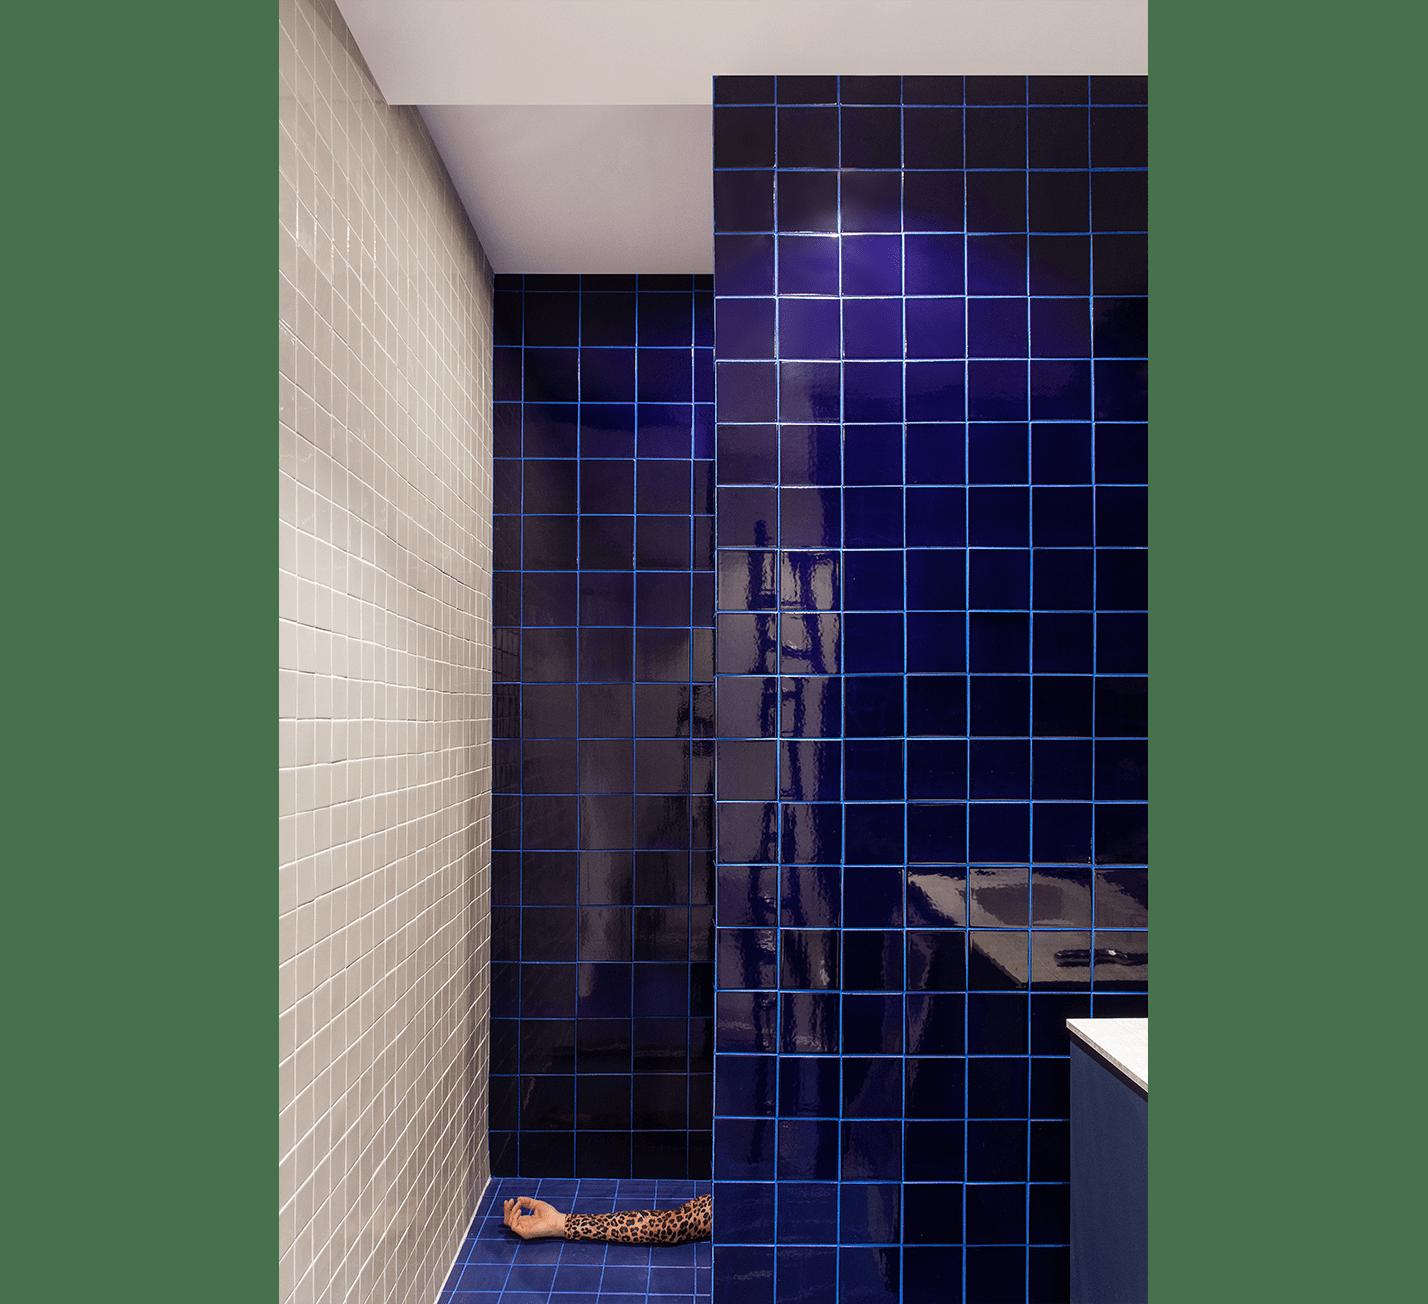 Projet-Senoch-Atelier-Steve-Pauline-Borgia-Architecte-interieur-04-min